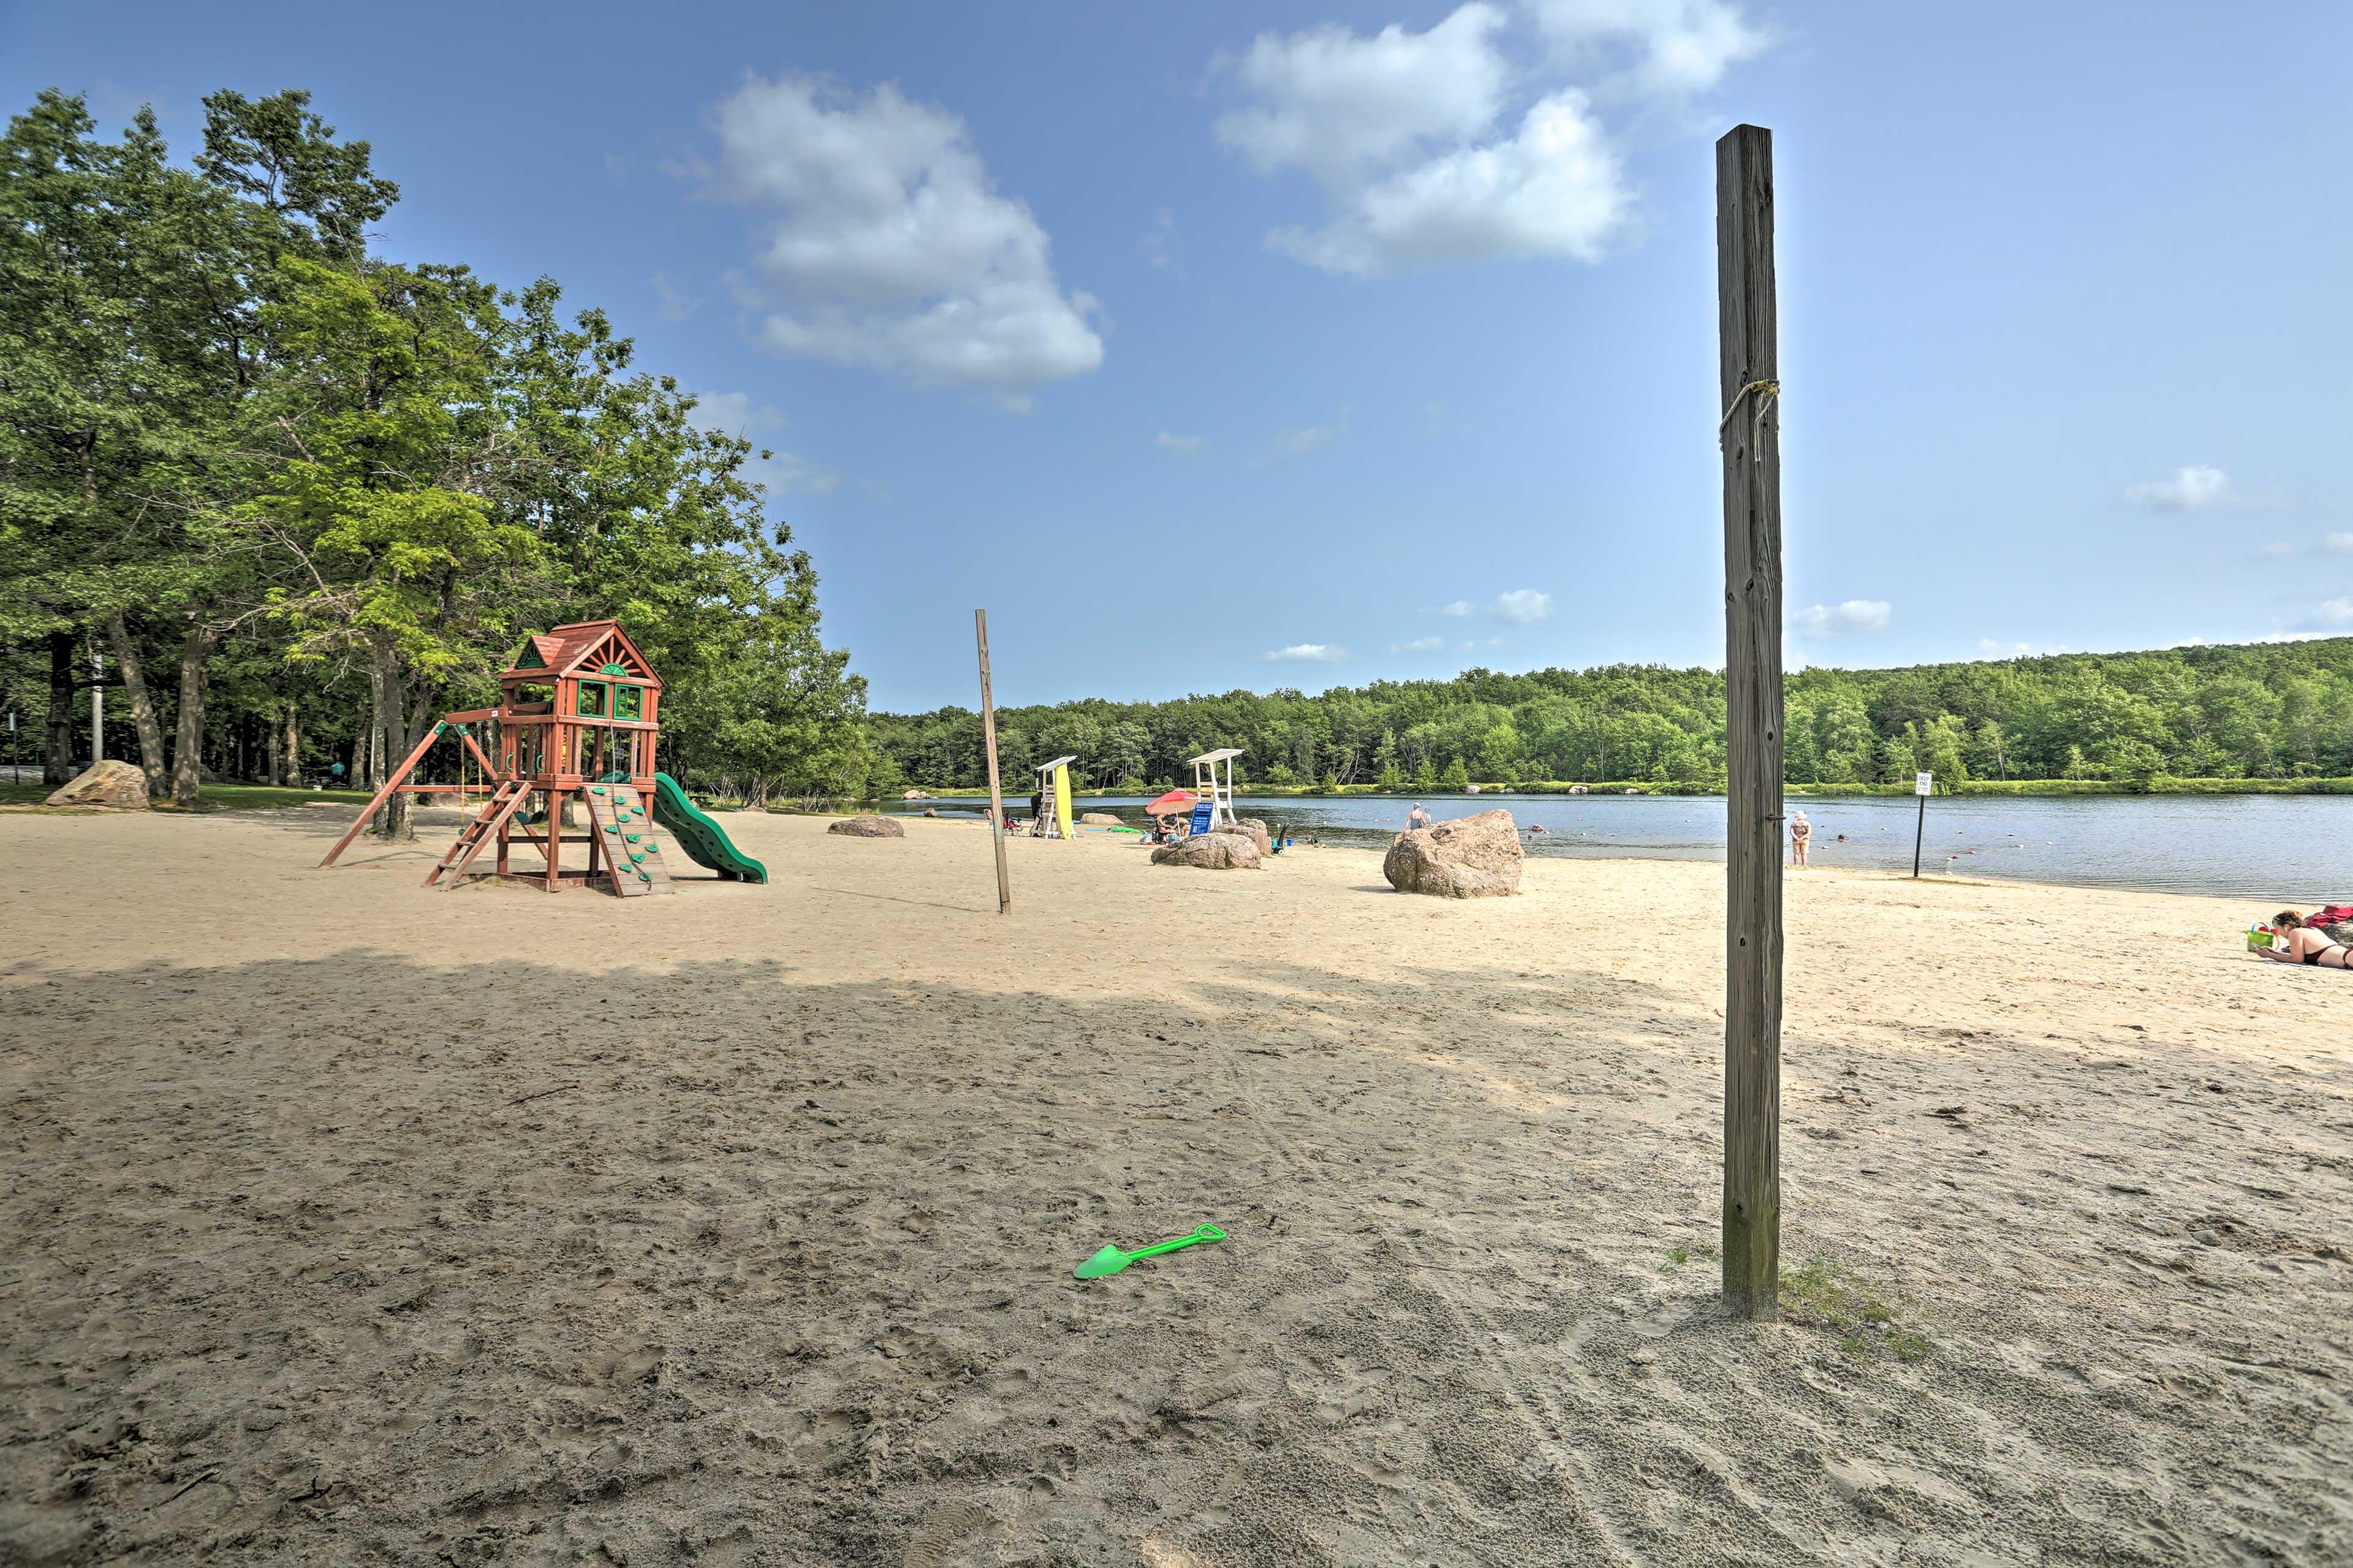 Enjoy access to this community beach!